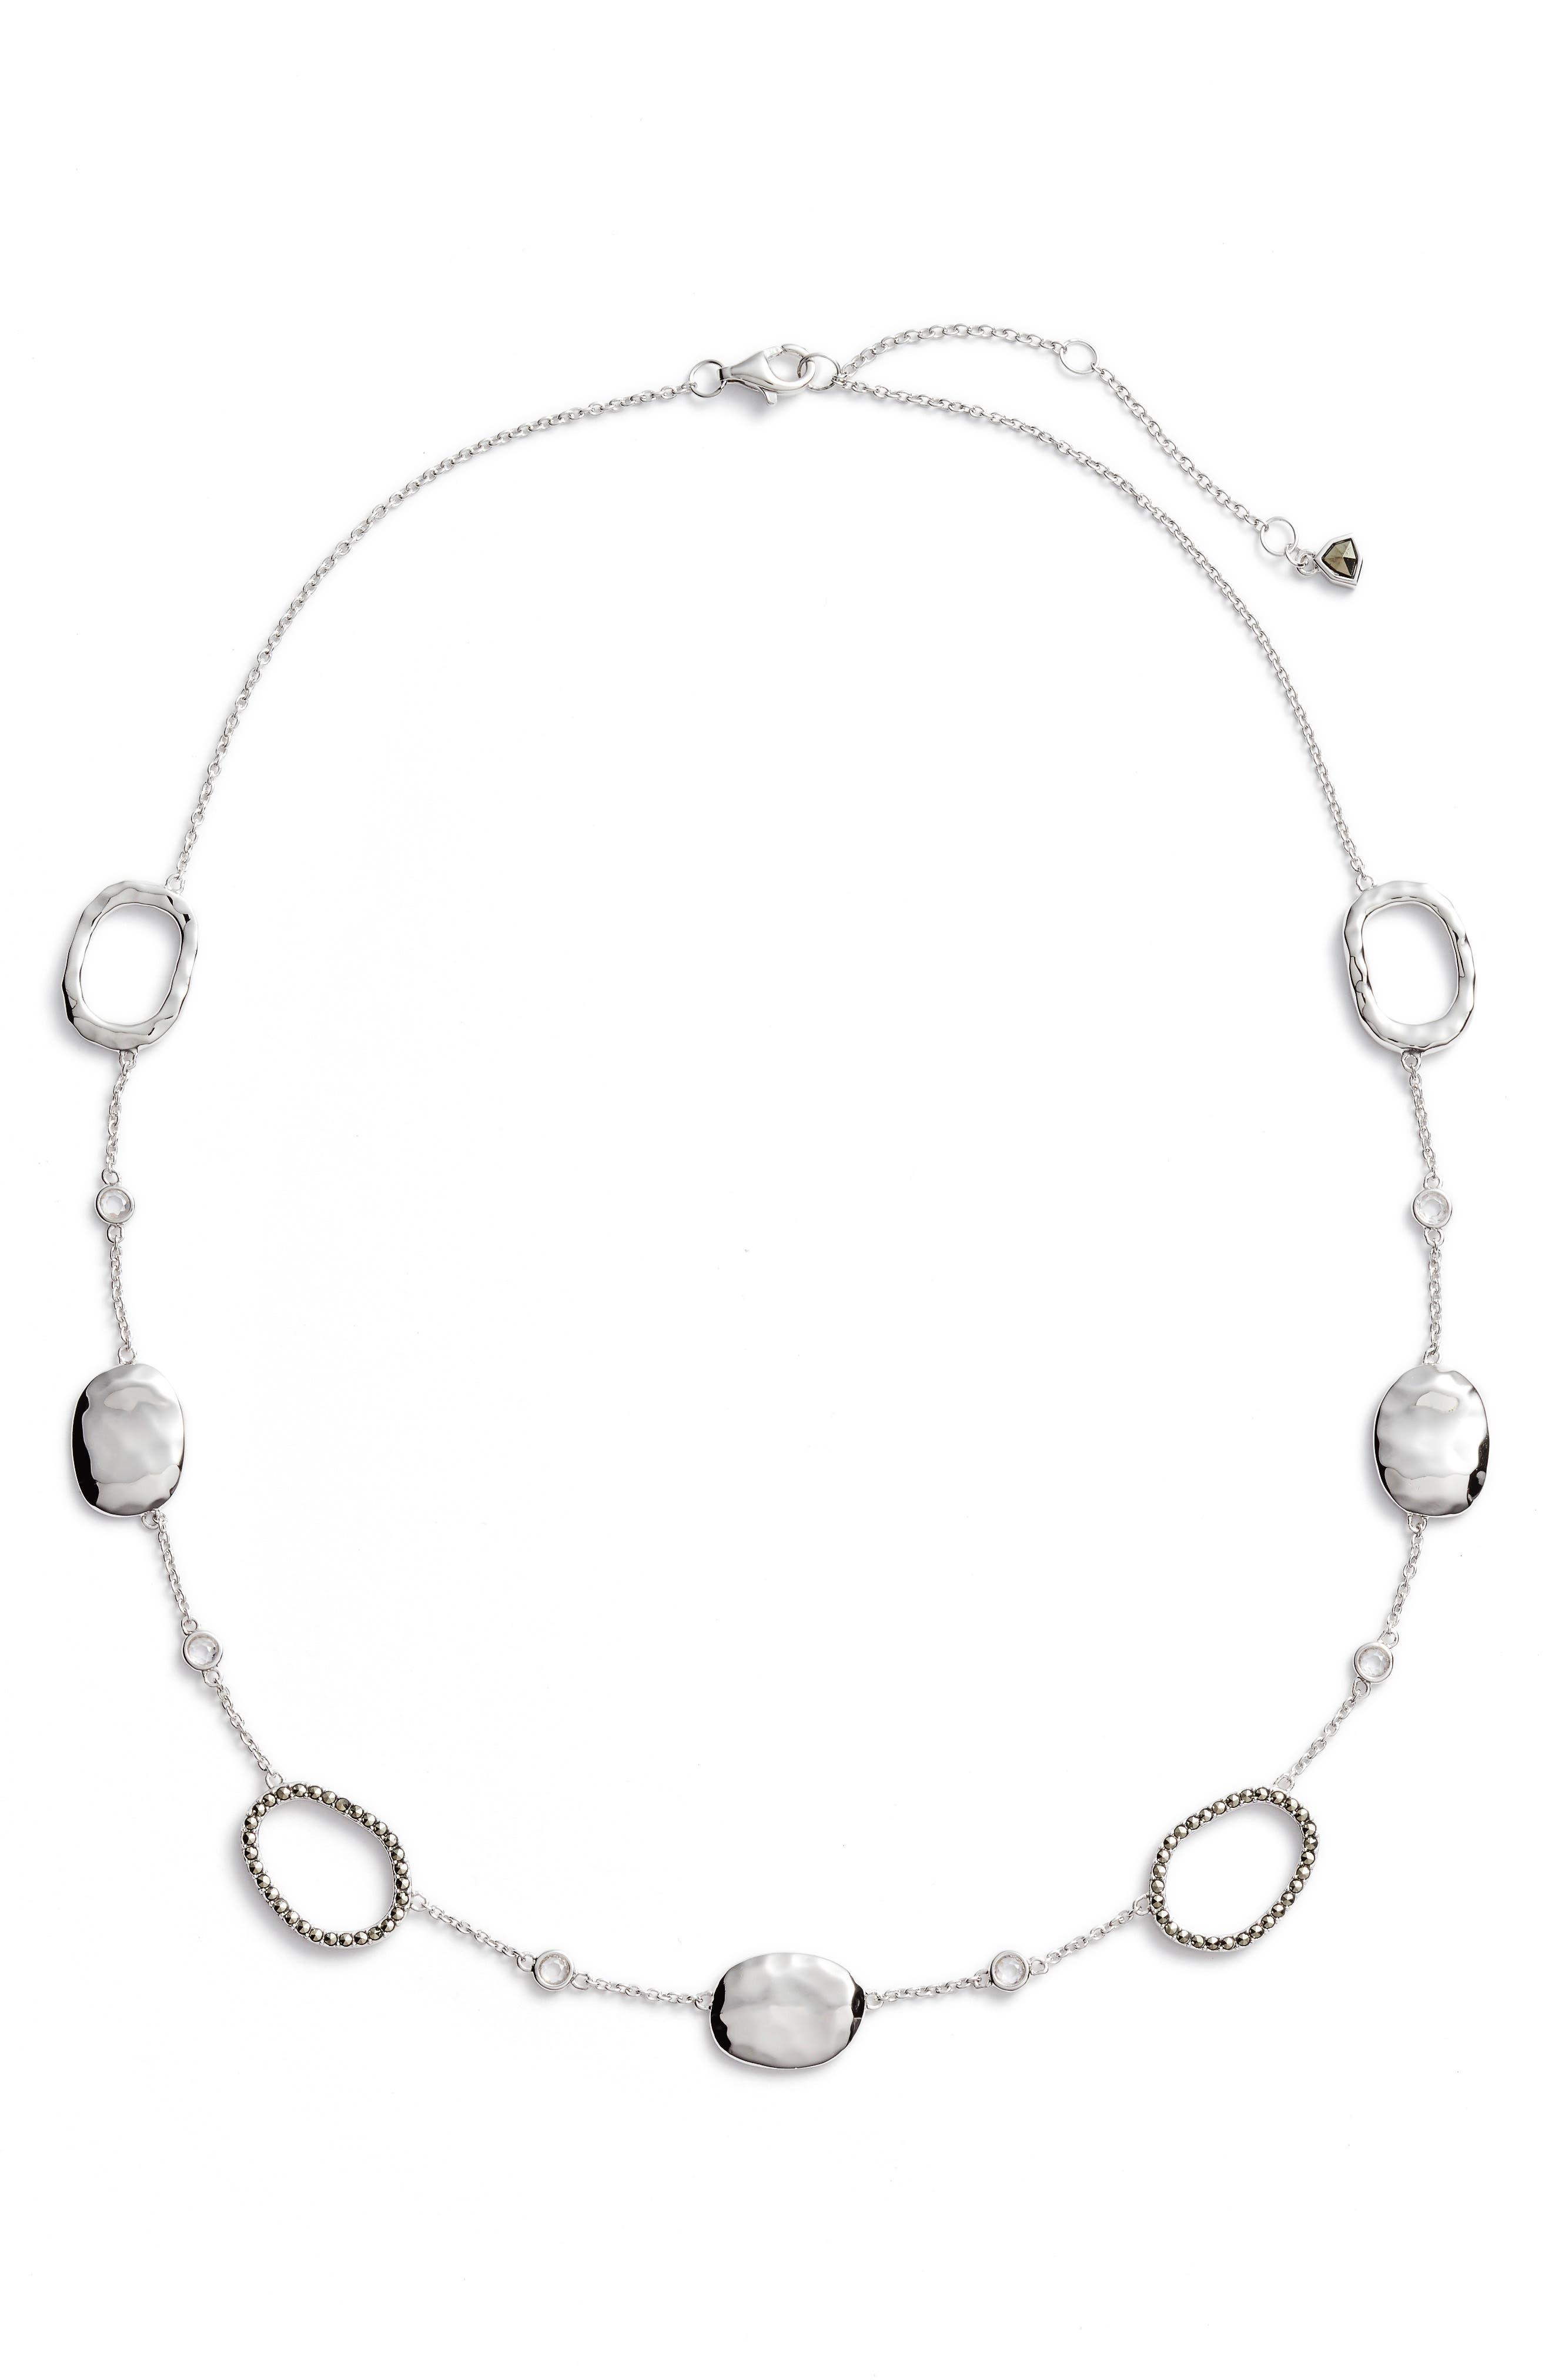 JUDITH JACK Crystal Collar Necklace